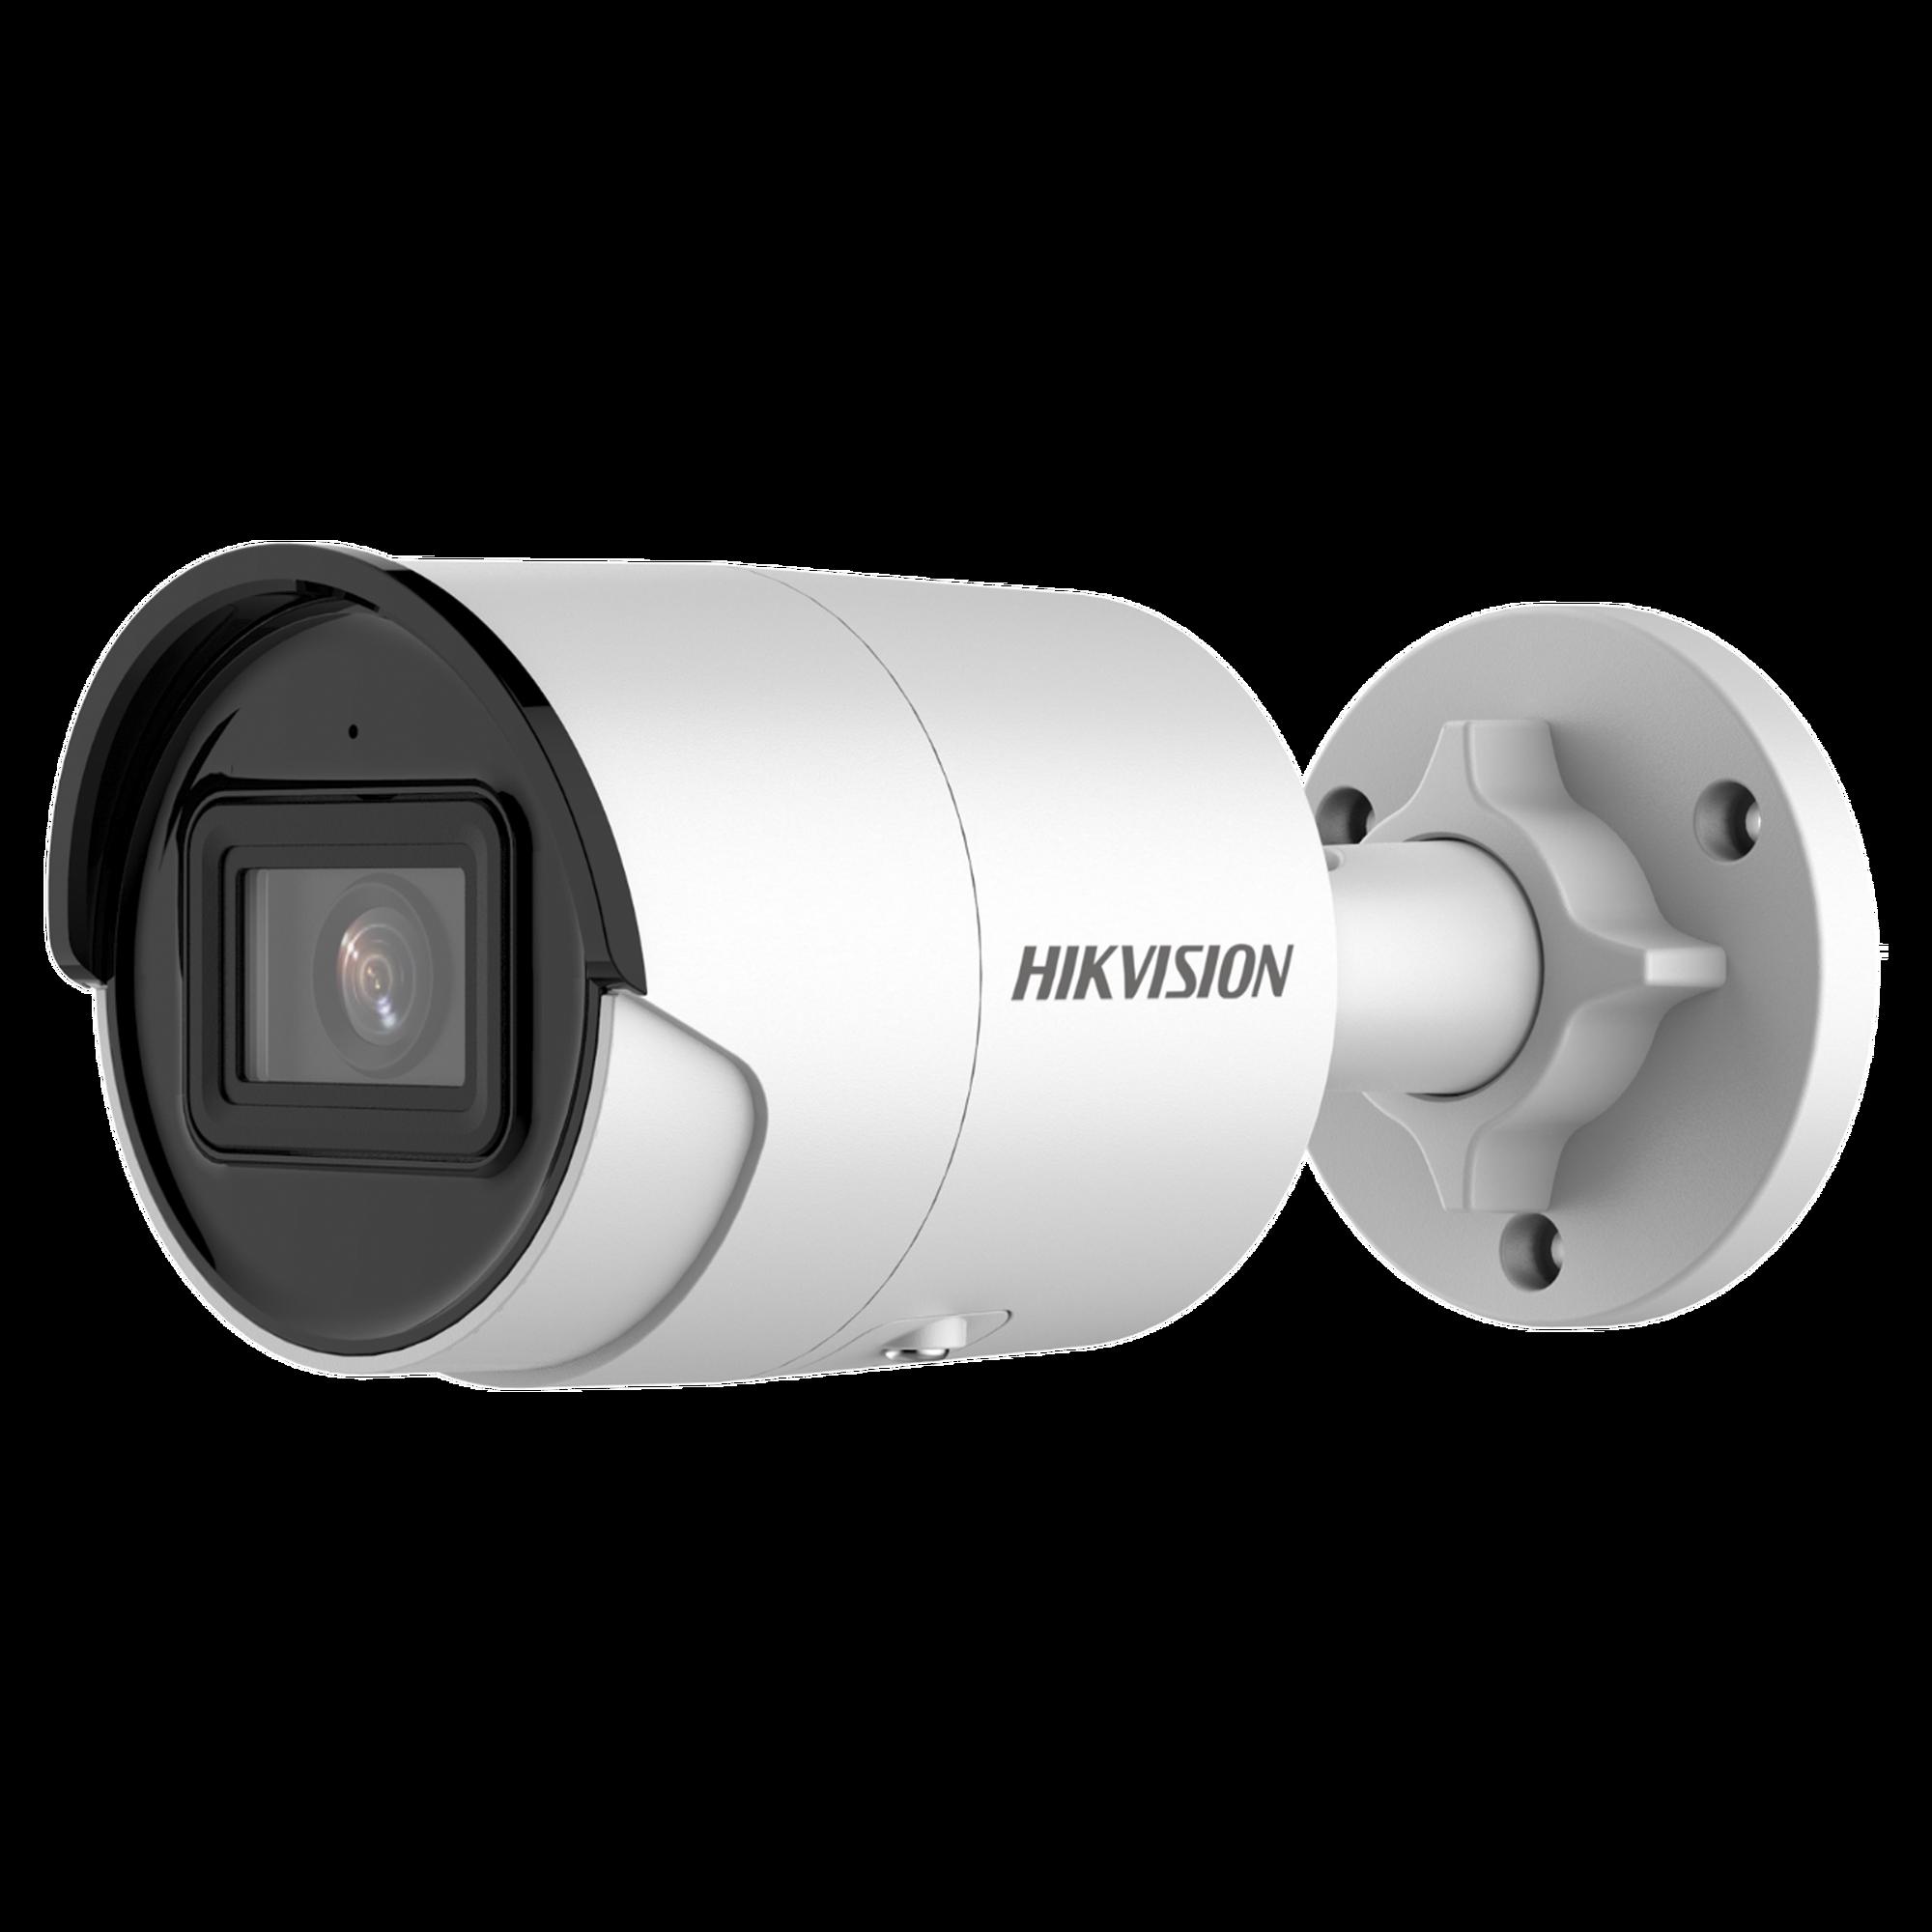 Bala IP 2 Megapixel / Lente 2.8 mm / 40 mts IR EXIR /Exterior IP67 / WDR 120 dB / PoE / Micrófono Integrado / Videoanaliticos (Filtro de Falsas Alarmas) / Ultra Baja Iluminación